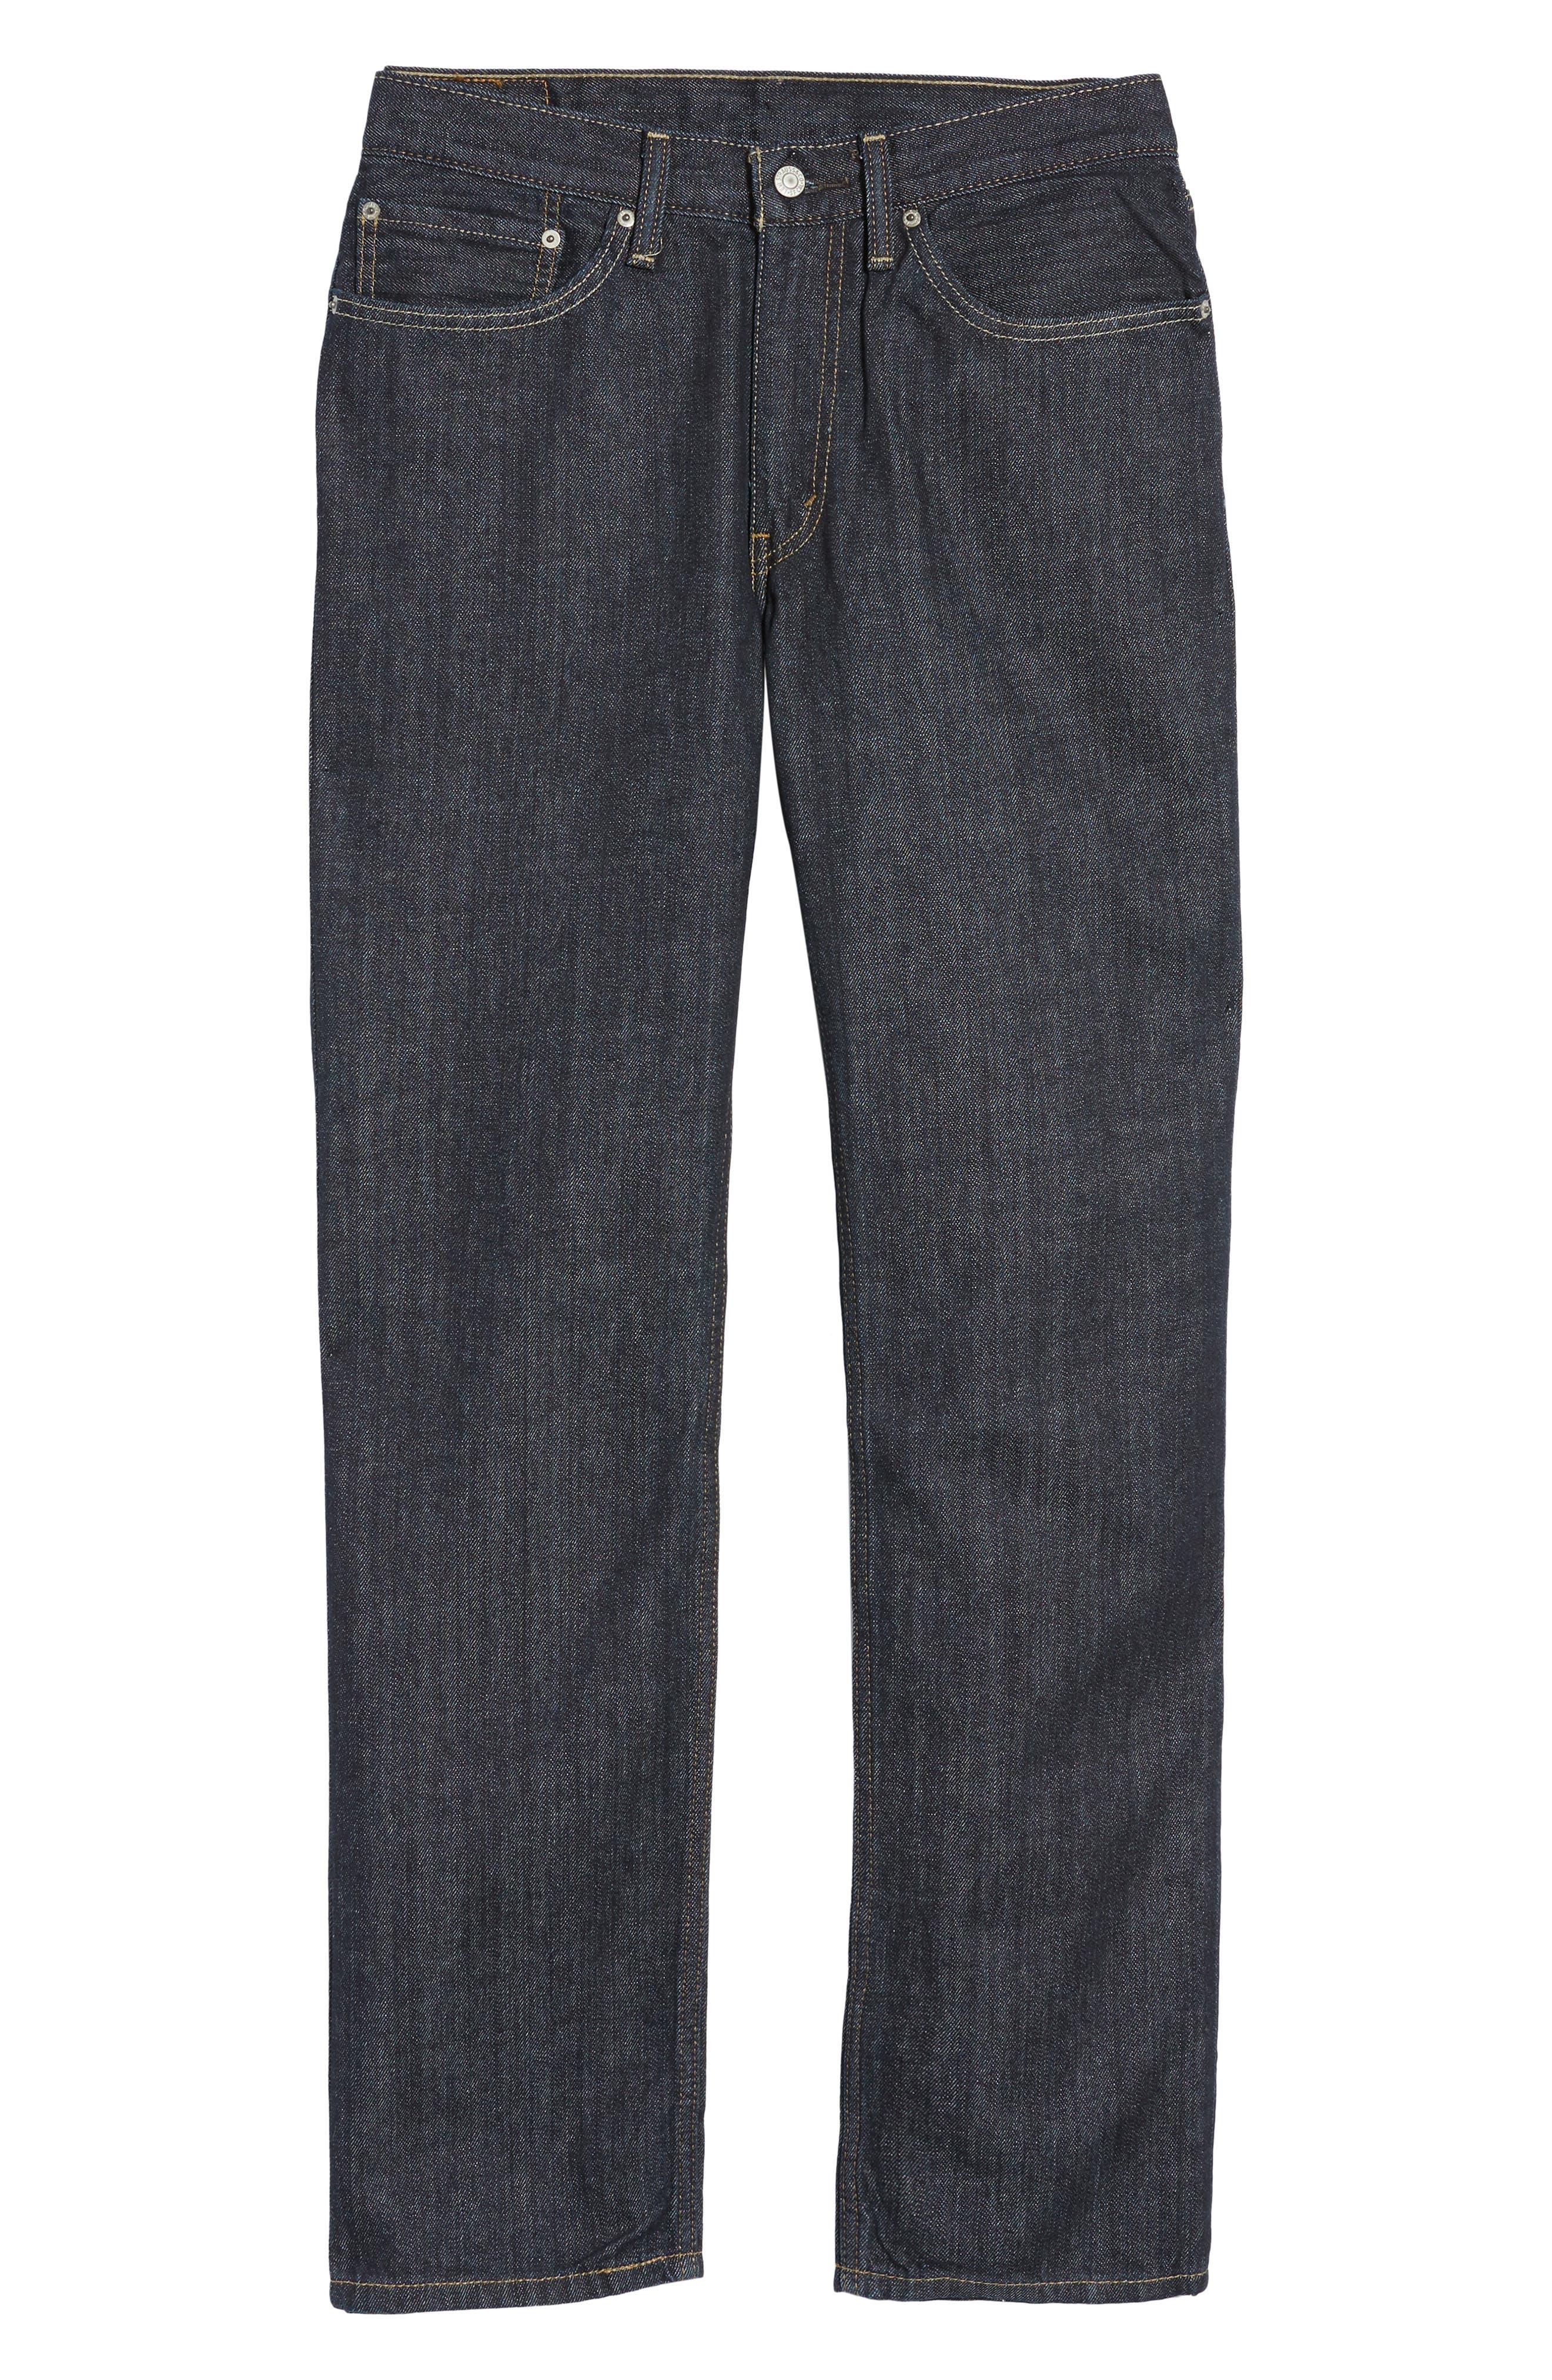 514<sup>™</sup> Straight Leg Jeans,                             Main thumbnail 1, color,                             TUMBLED RIGID